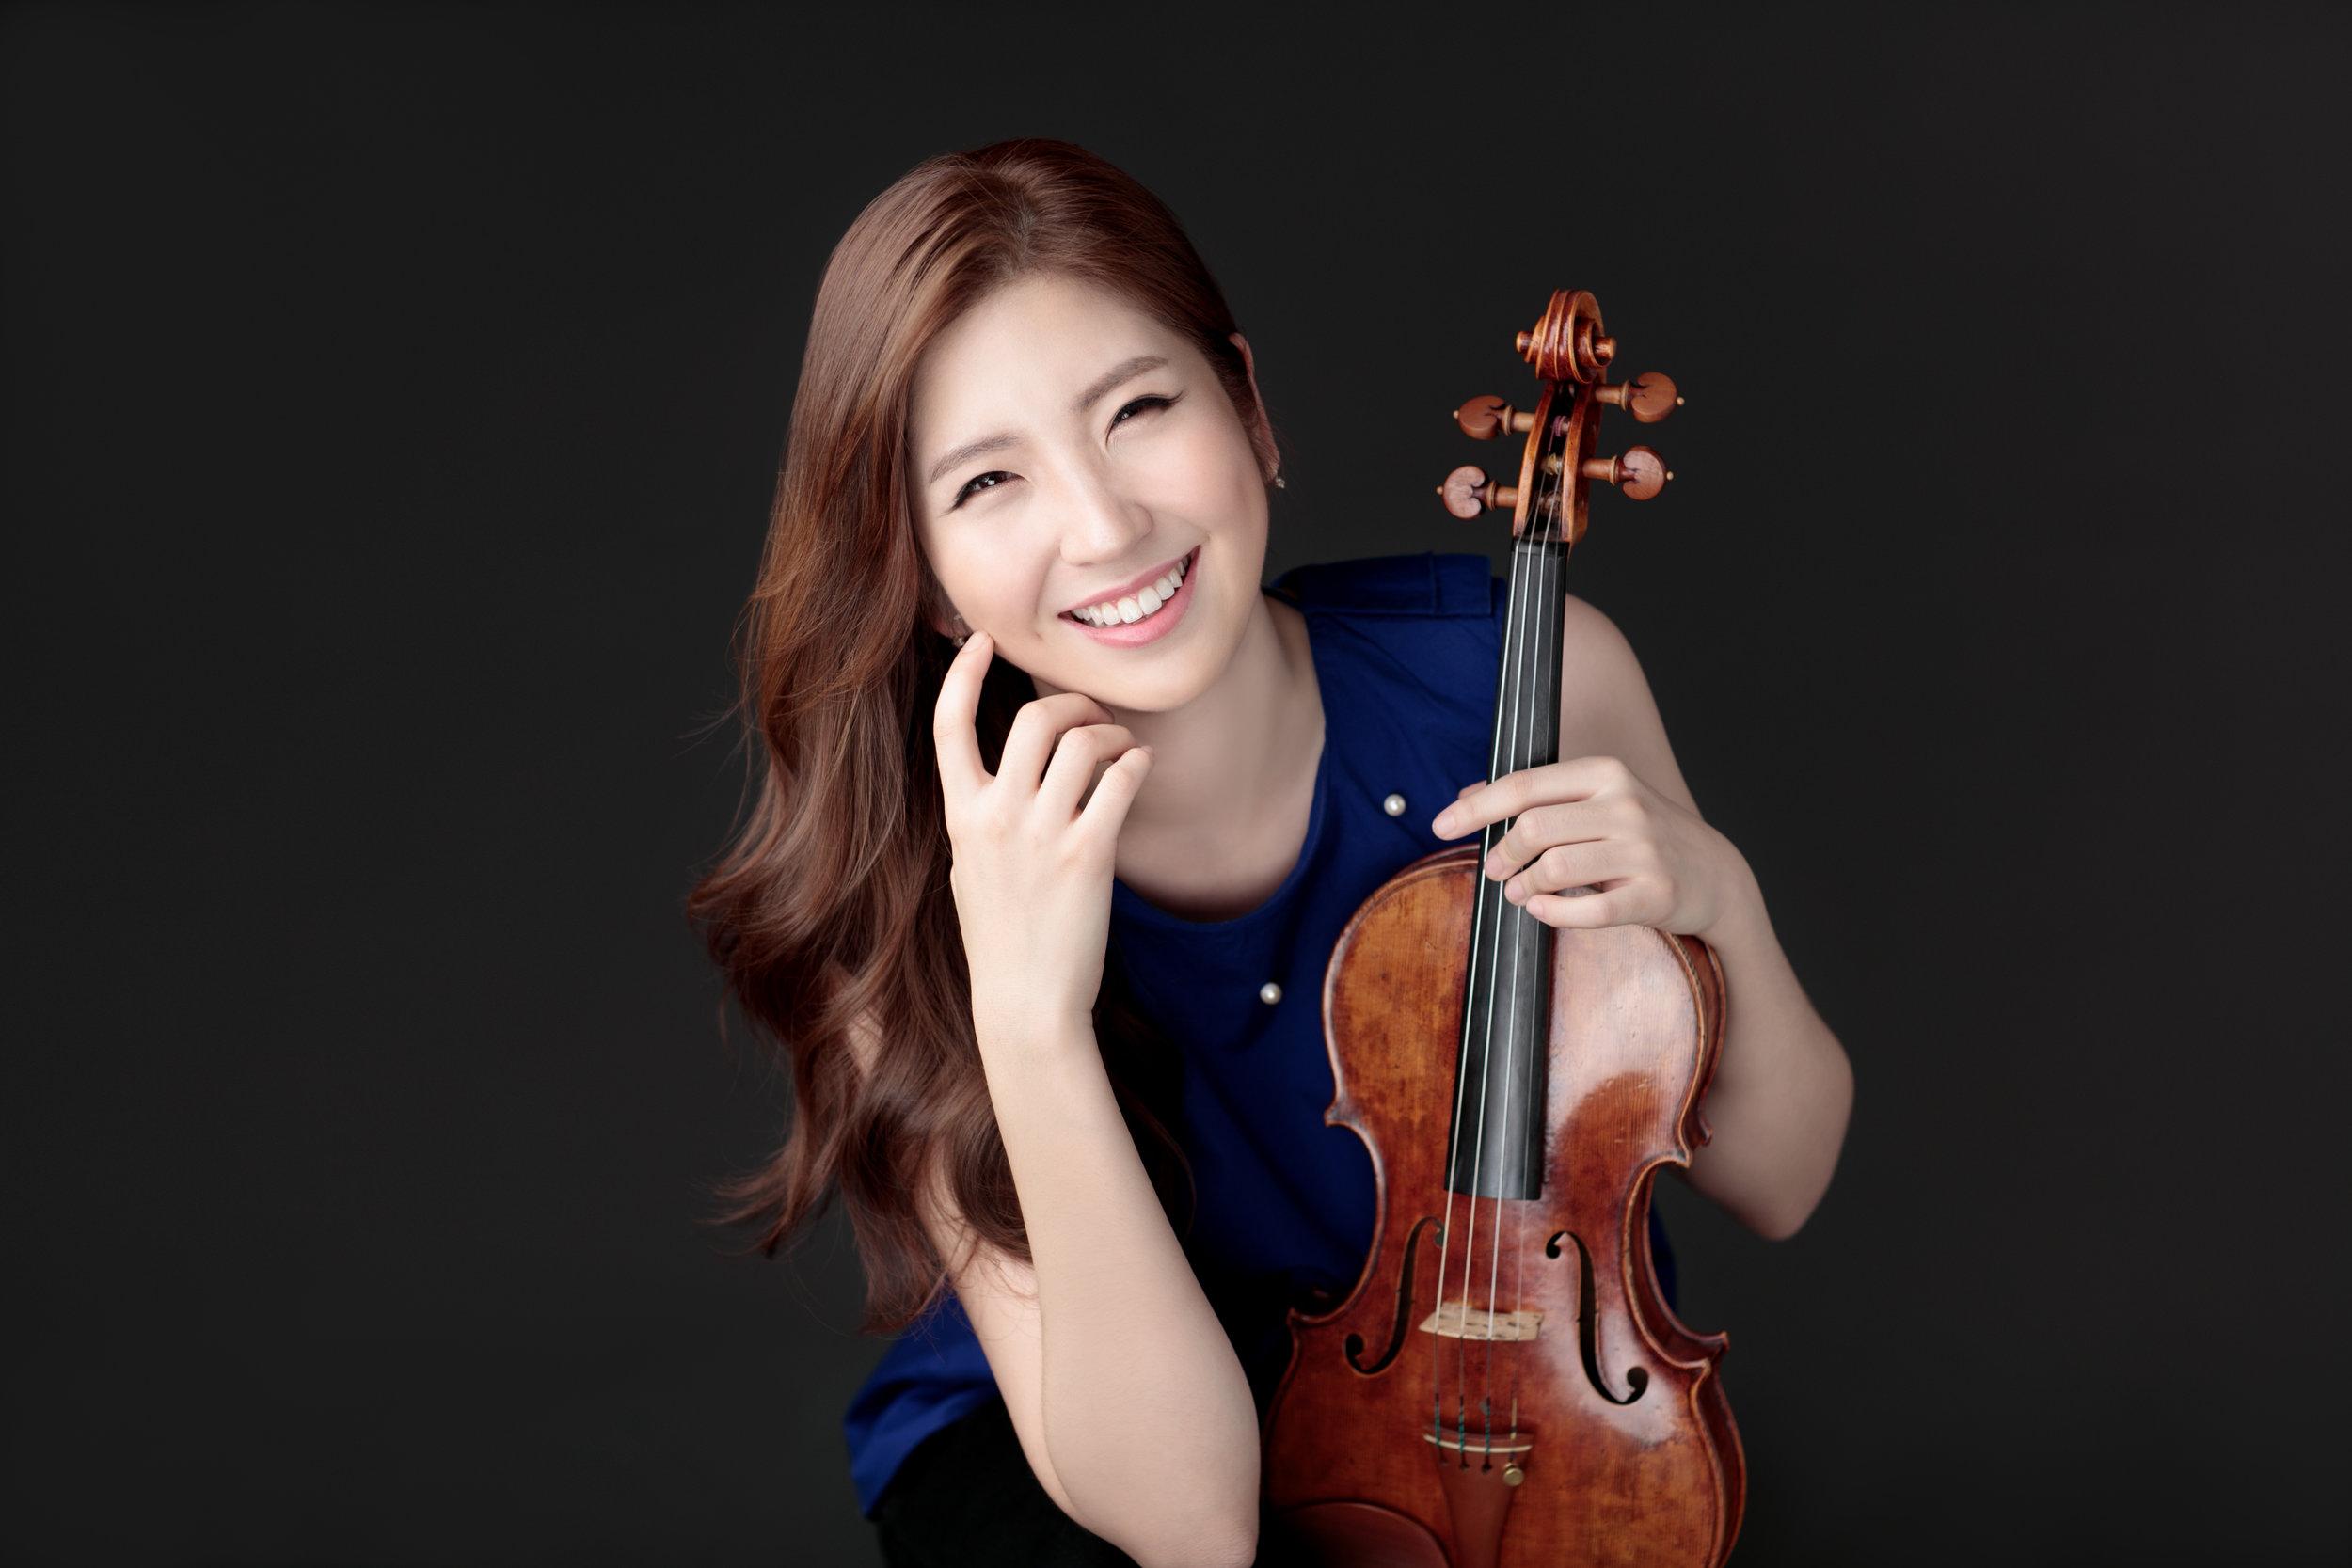 Suhyun Park  New York Philharmonic Violinist  纽约爱乐小提琴演奏家